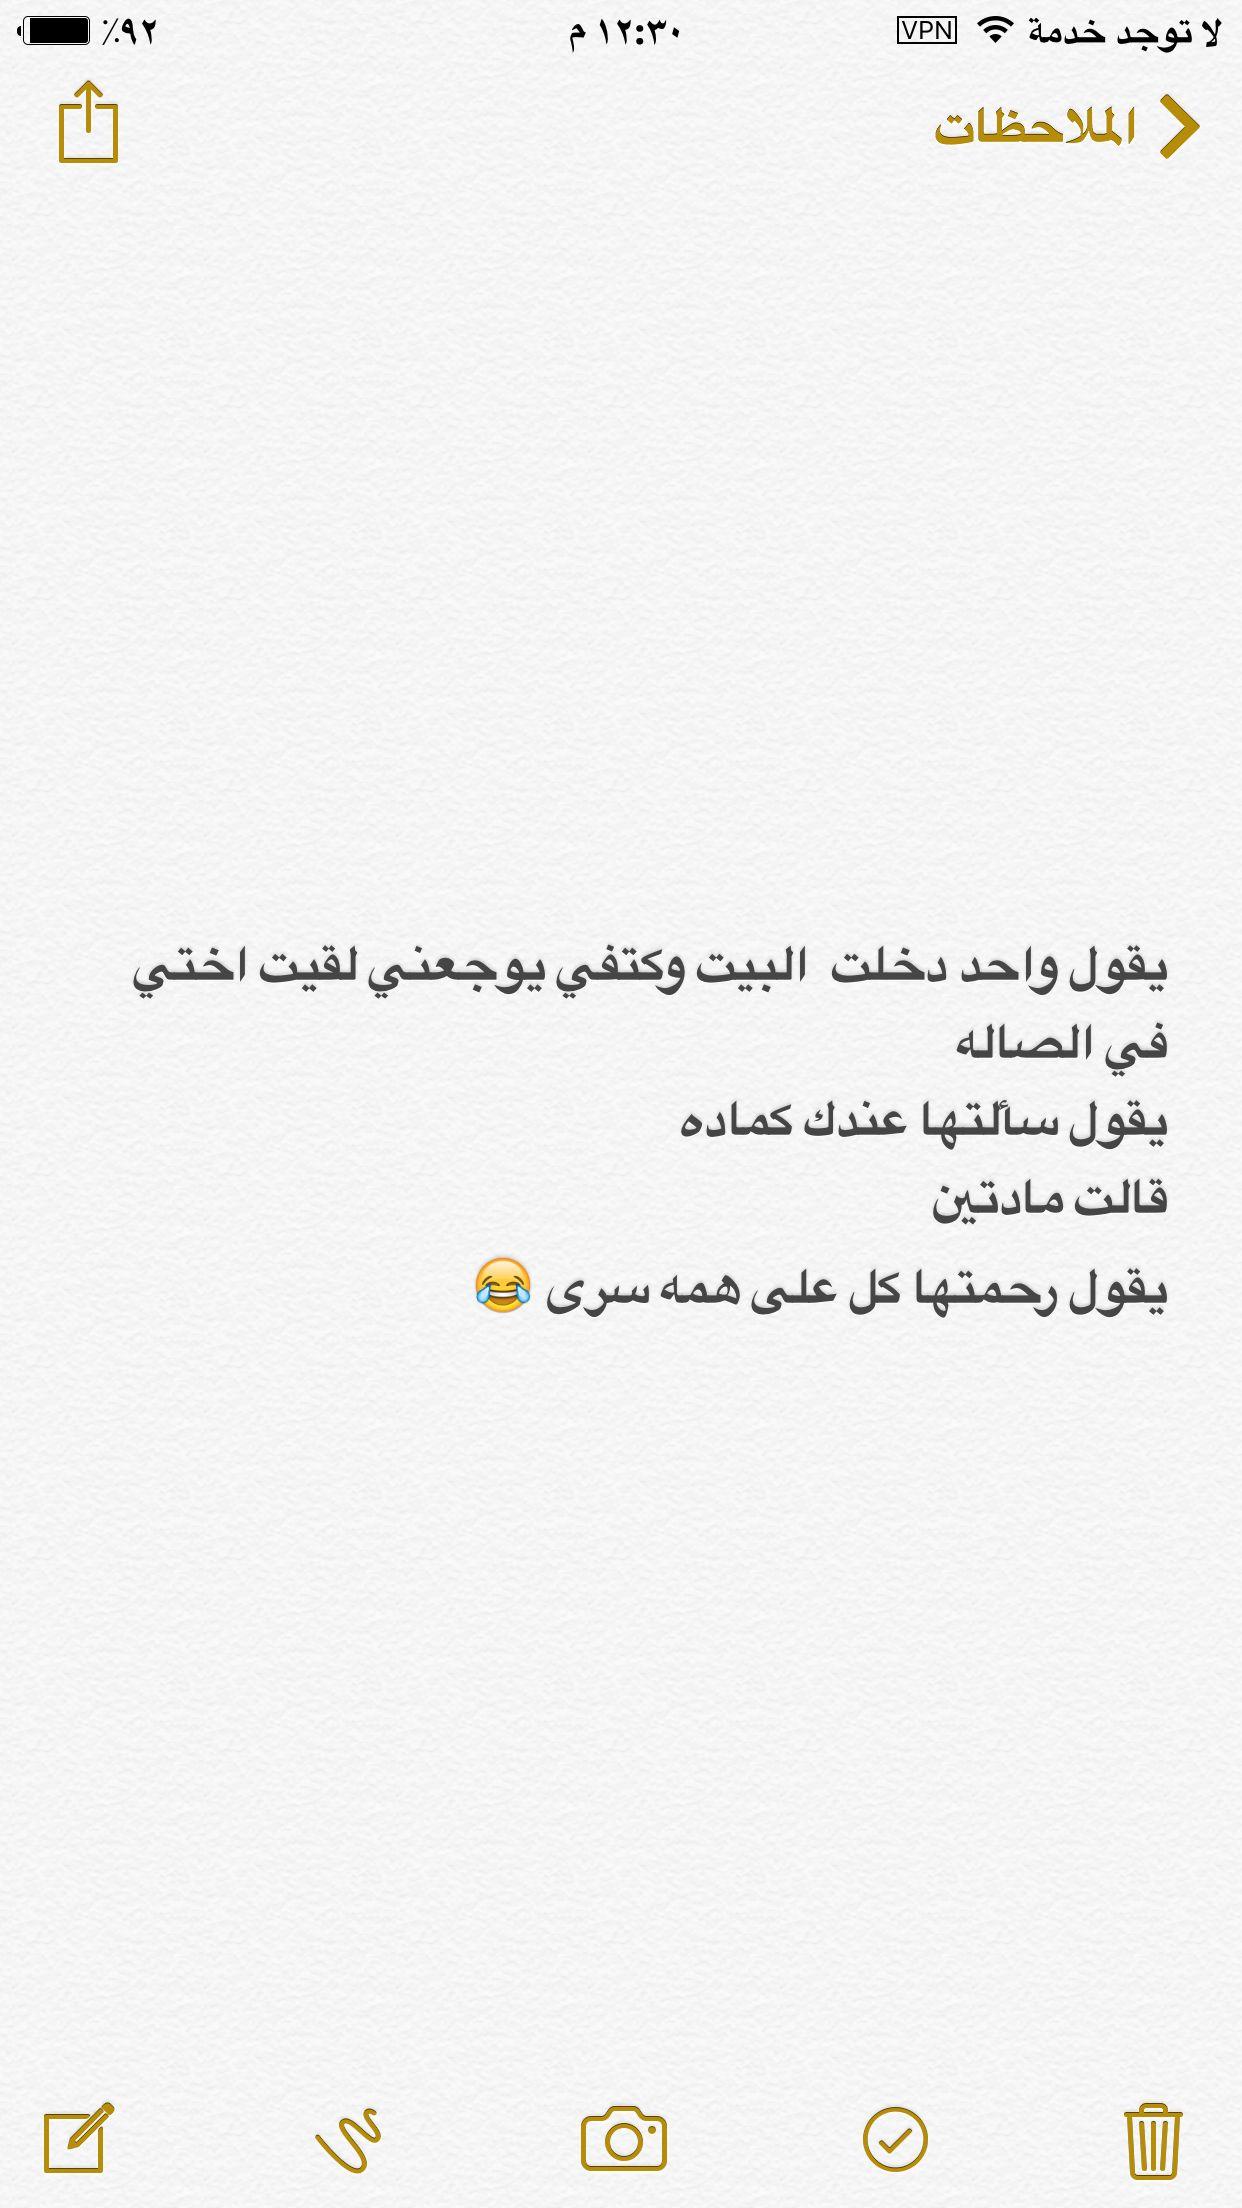 كل على همه سرى Math Arabic Calligraphy Math Equations